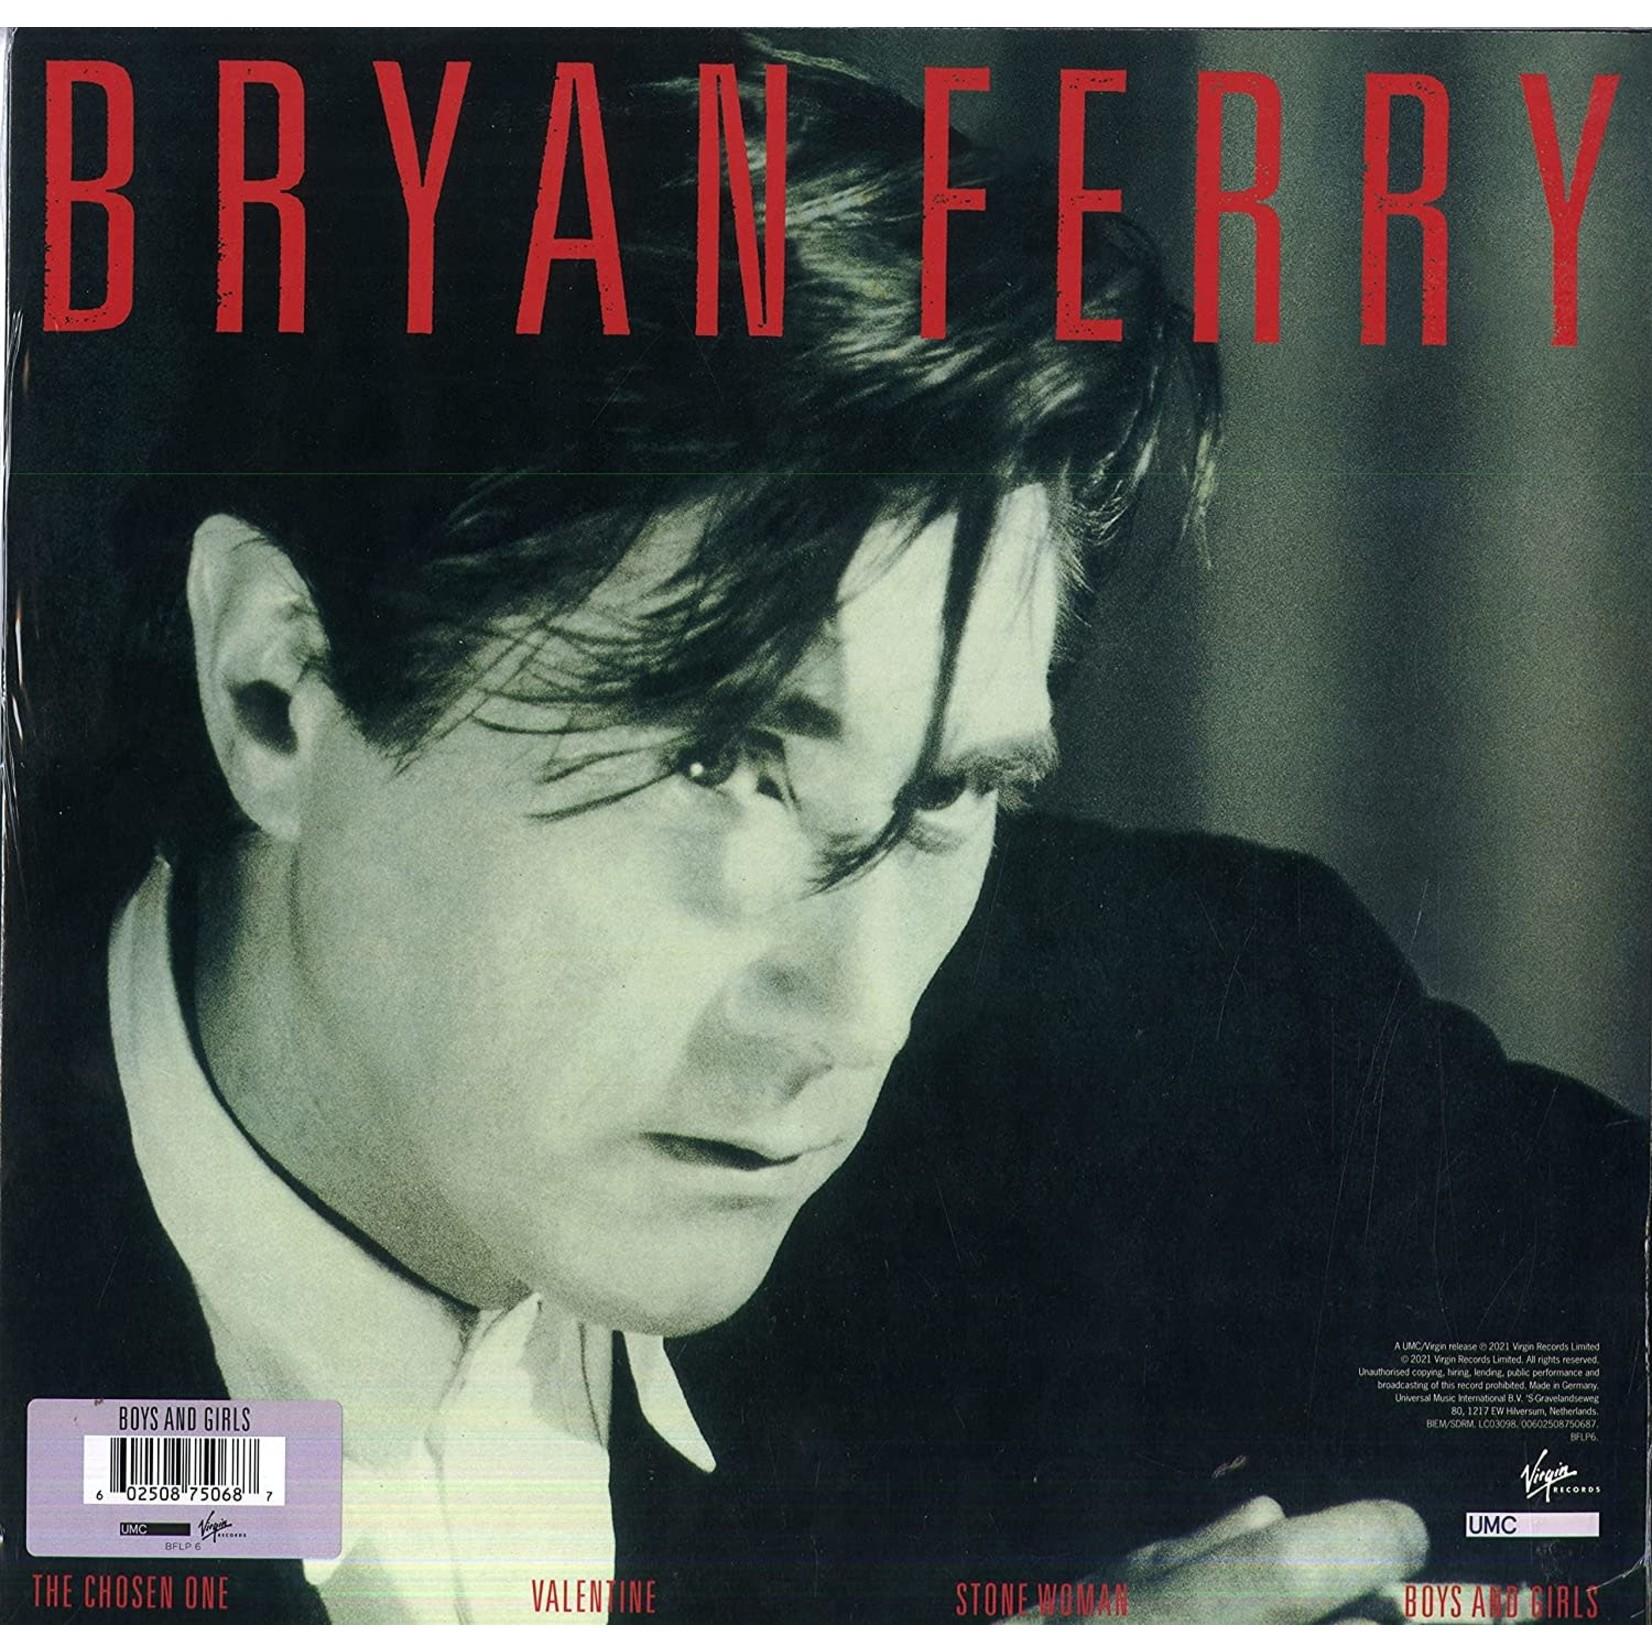 BRYAN FERRY BOYS AND GIRLS (LP)